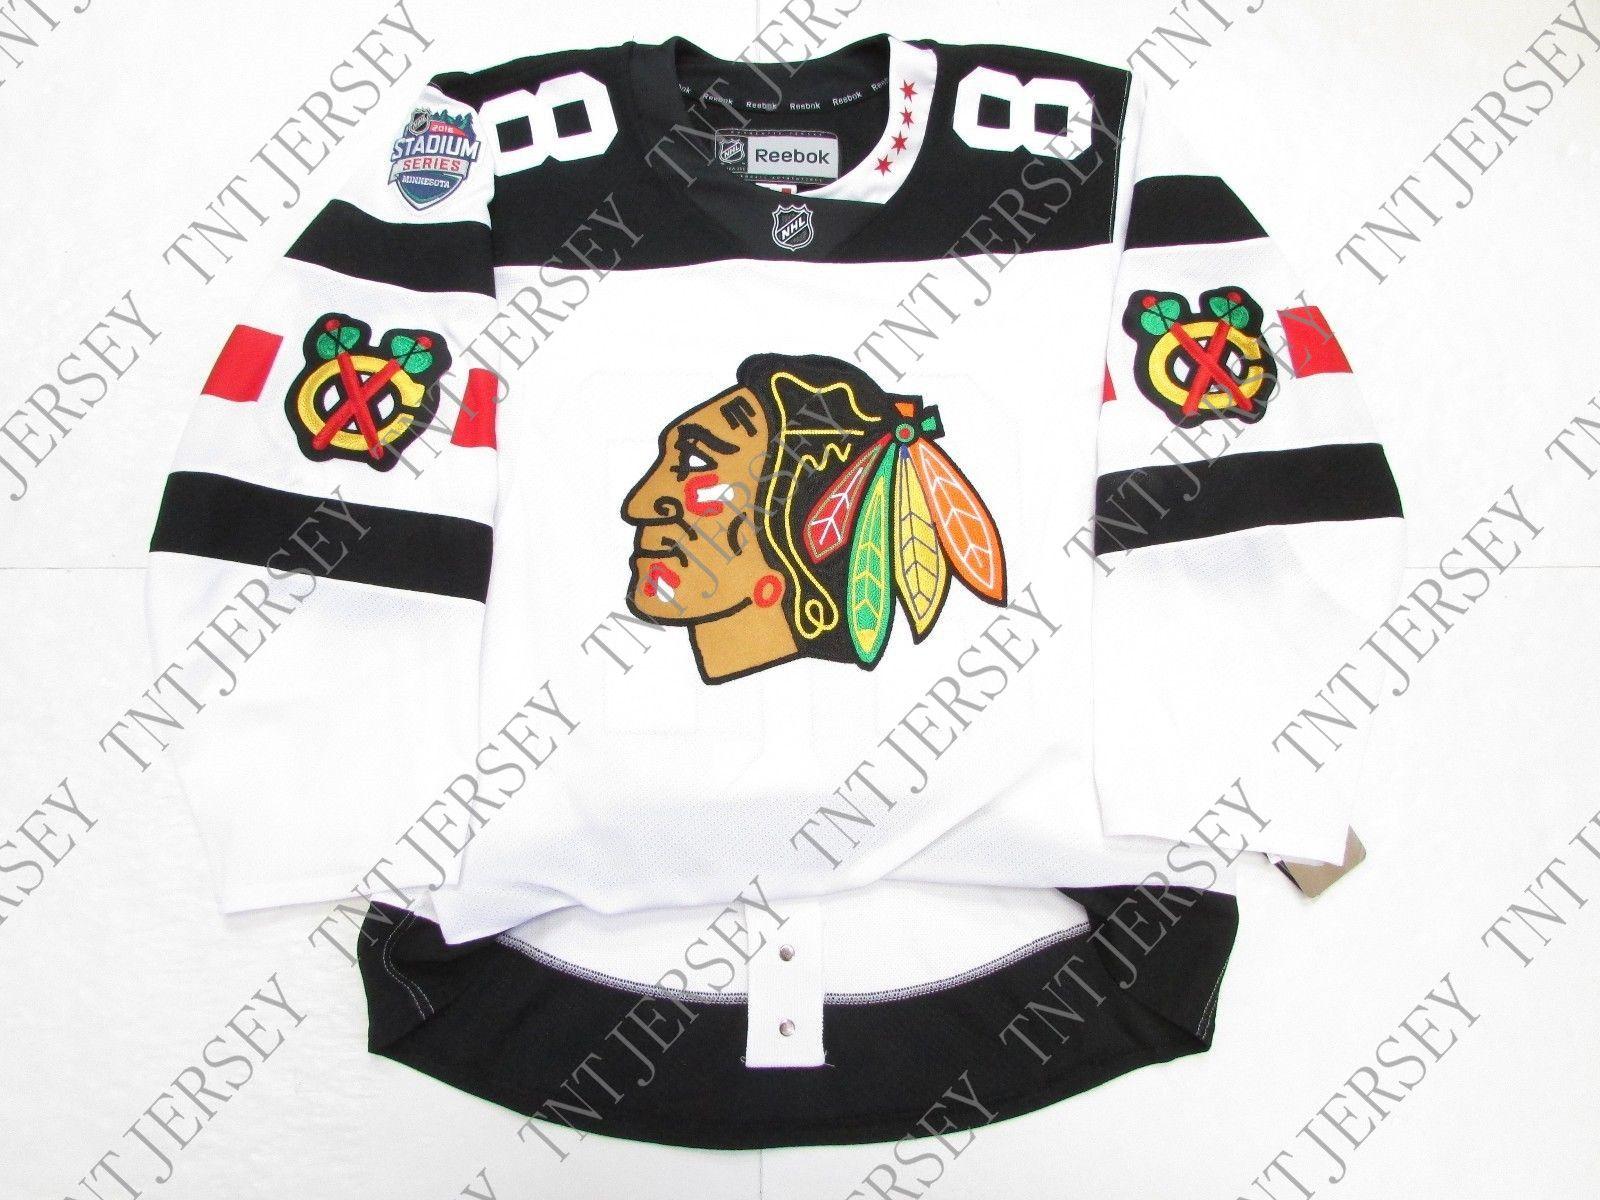 low priced 1bd79 b5c50 blackhawks 2016 stadium series jersey